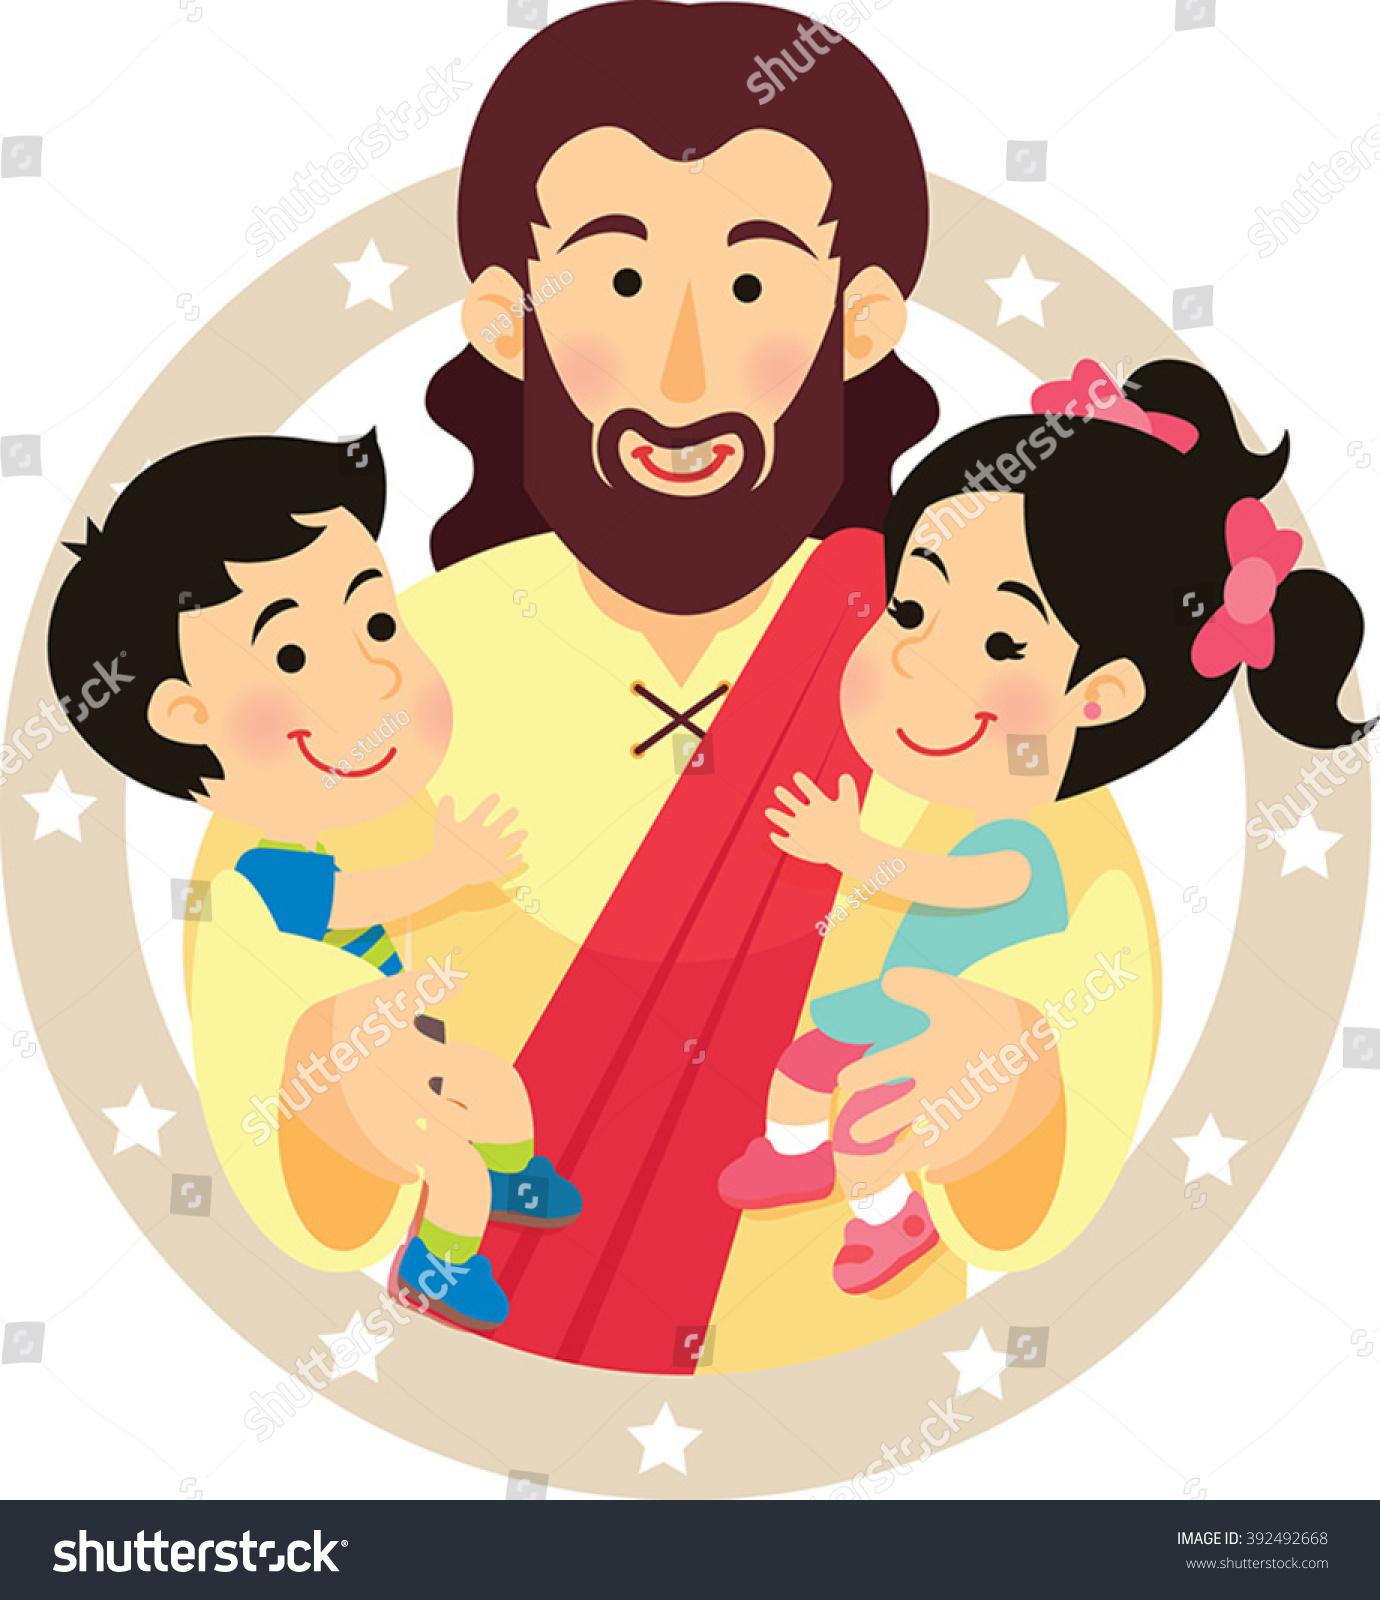 Jesus Love Children Stock Vector (Royalty Free) 392492668.